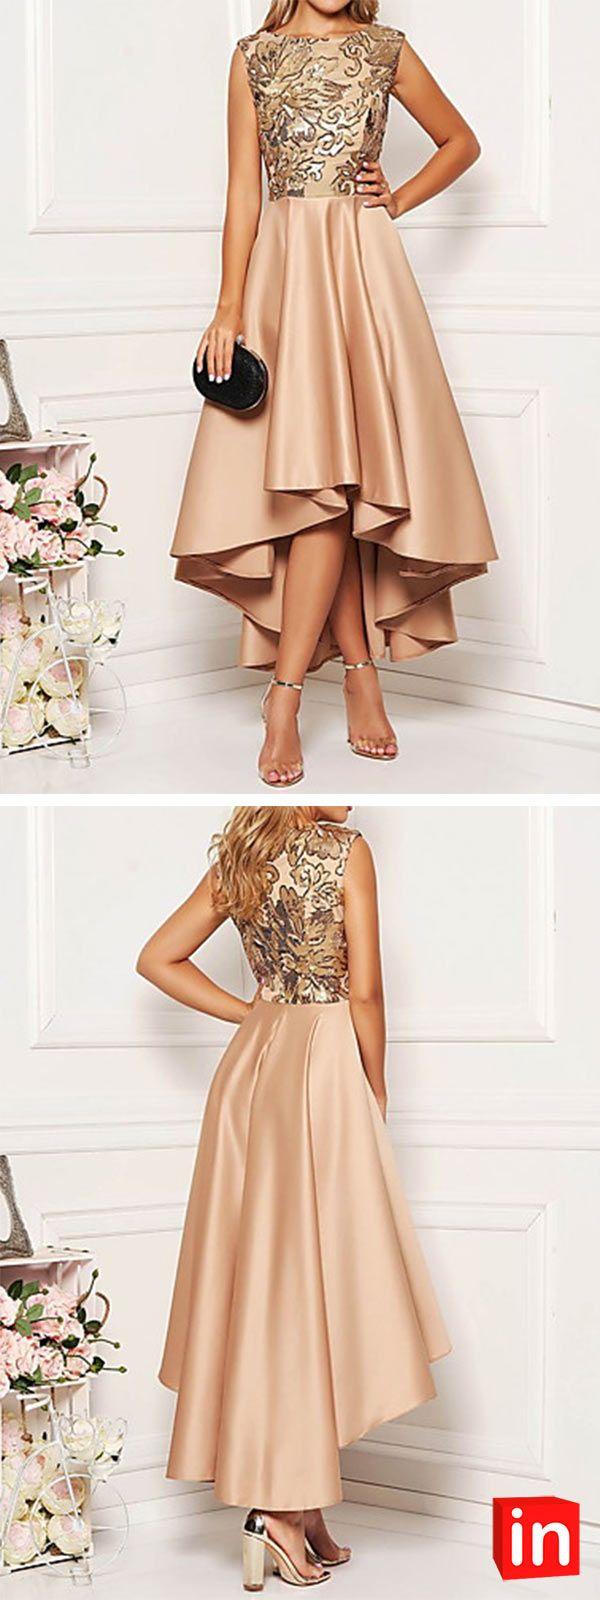 Women's Elegant A Line Dress 1